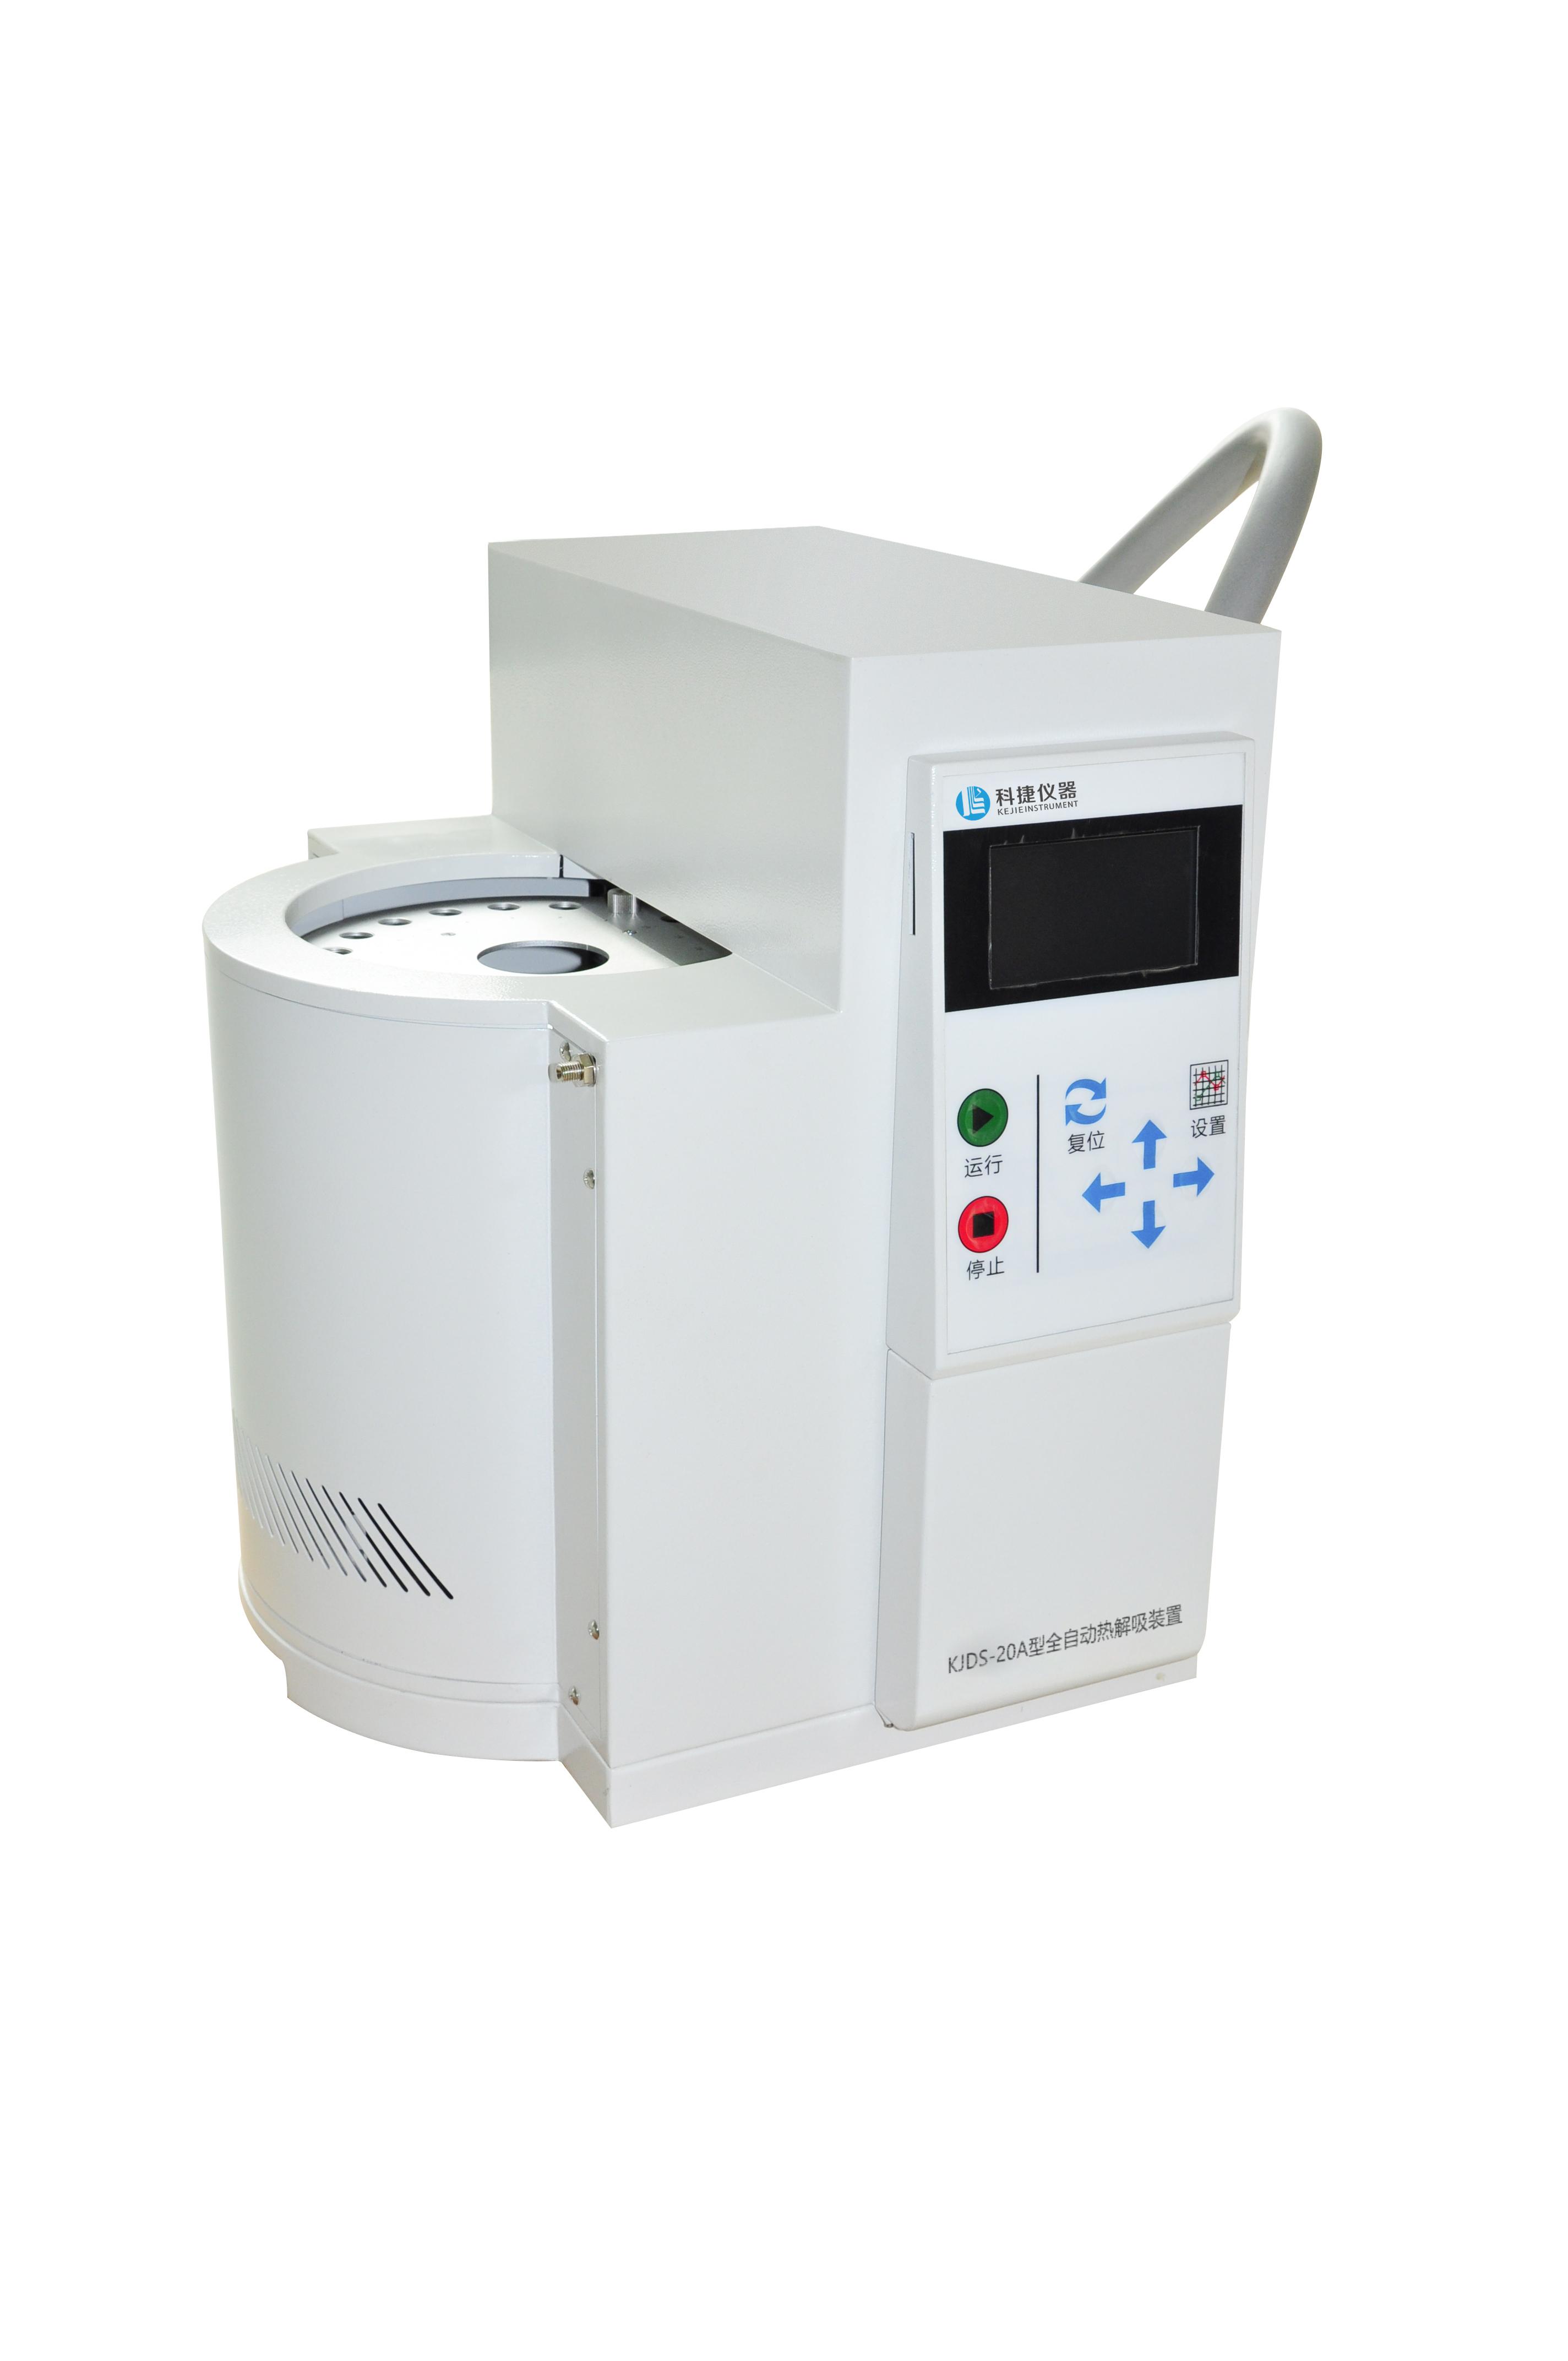 KJZ-300型自动二次热解吸仪